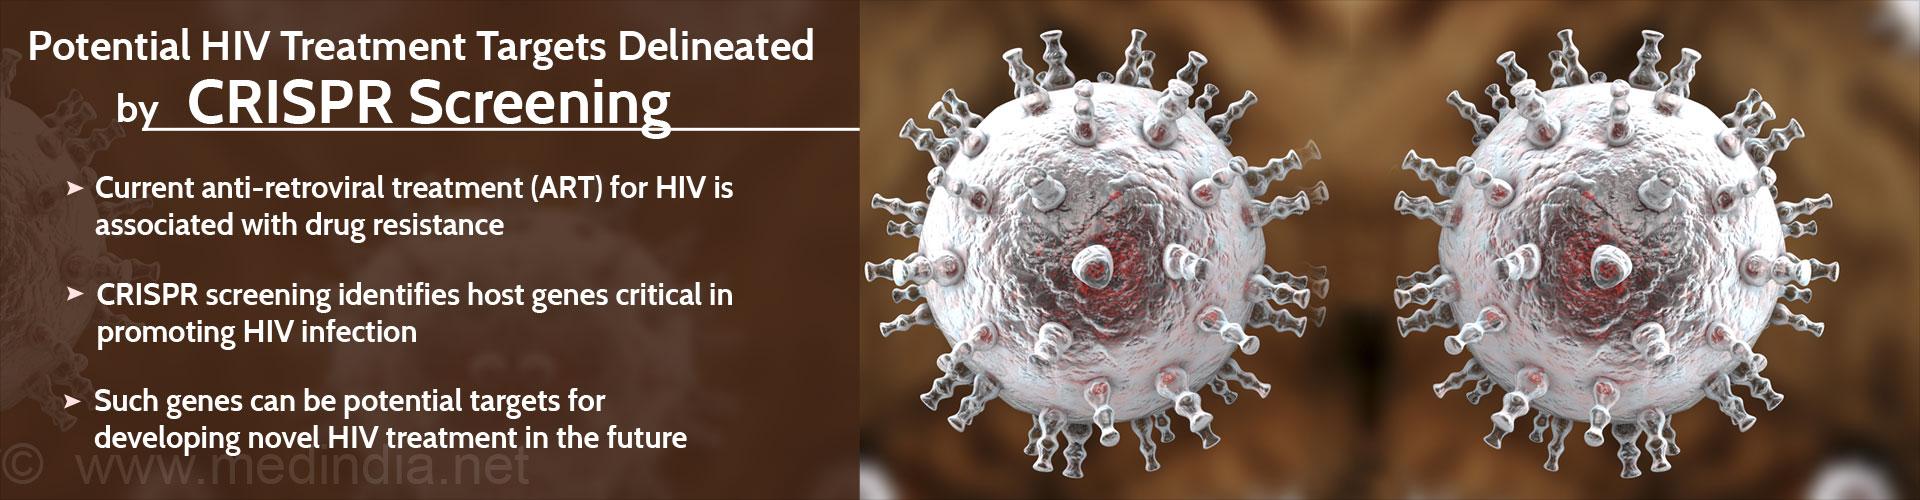 CRISPR Screening Successfully Identifies Potential HIV Treatment Targets